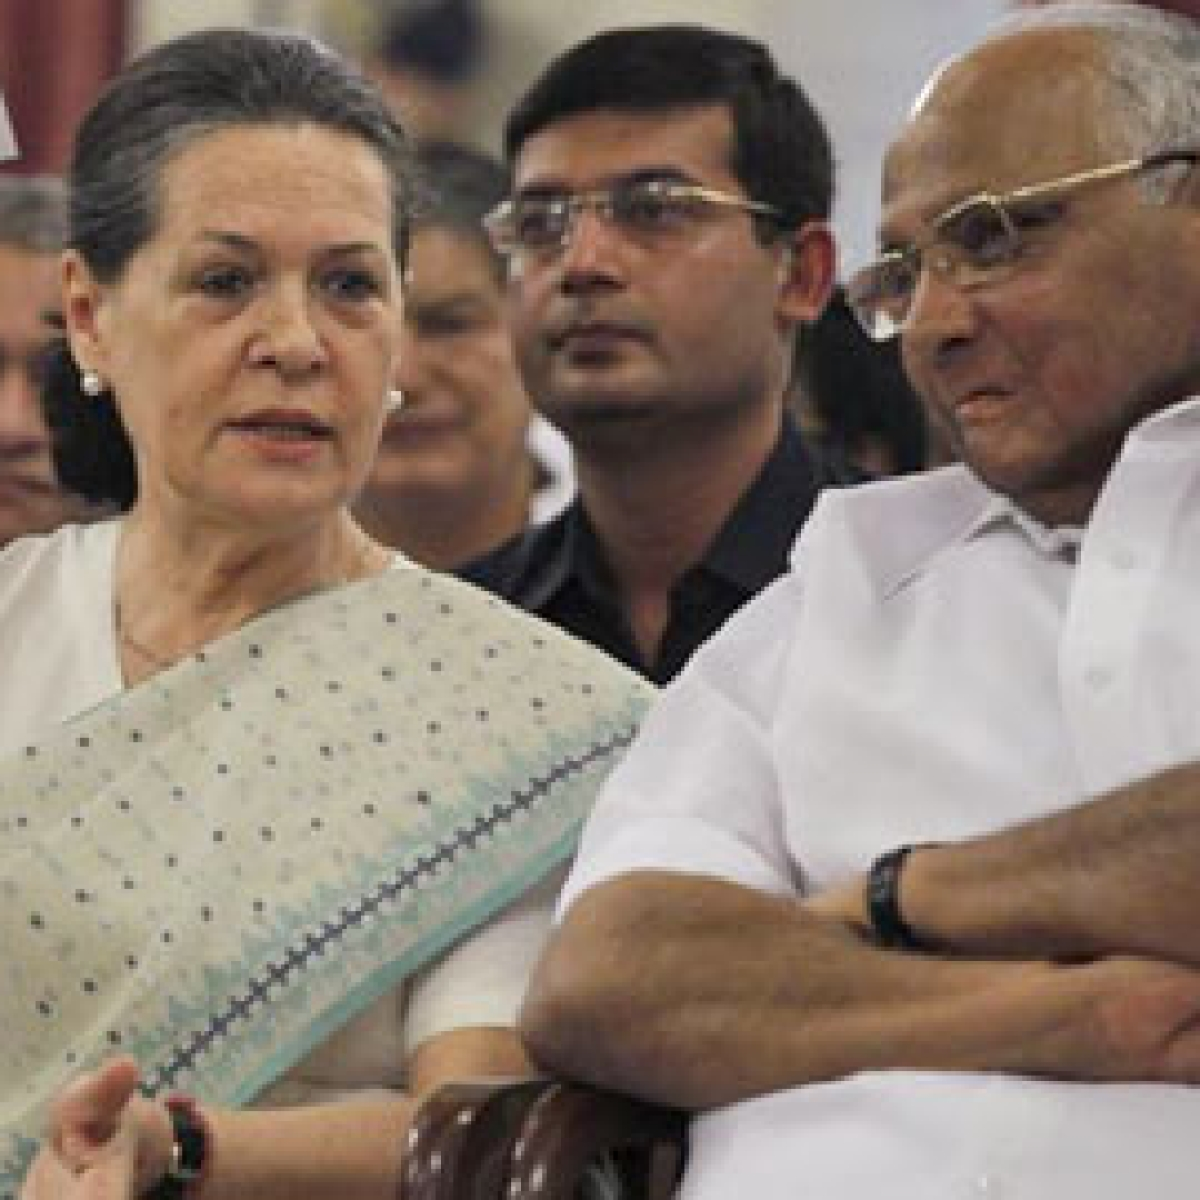 Congress snubs Shiv Sena on UPA leadership issue